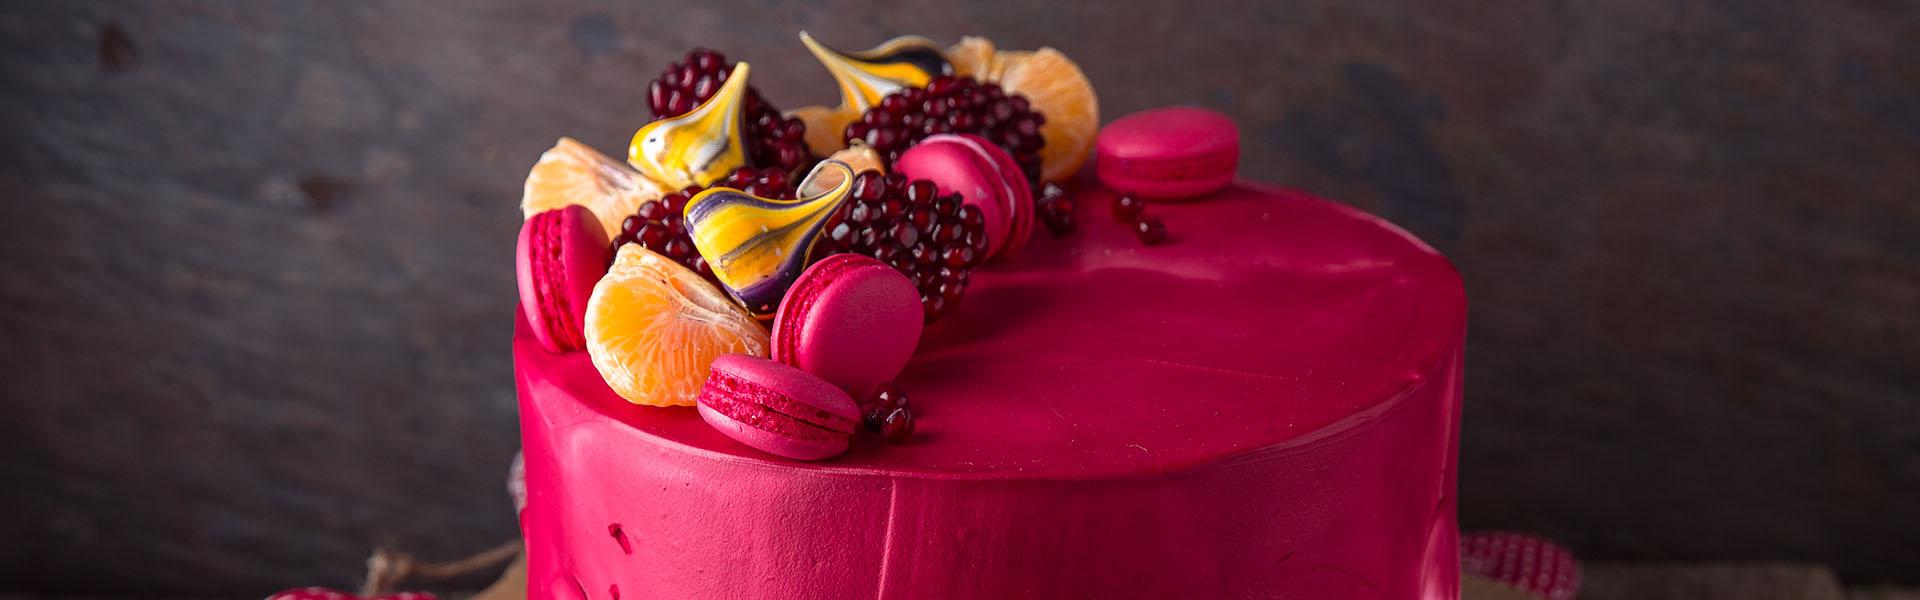 cake-design-desk